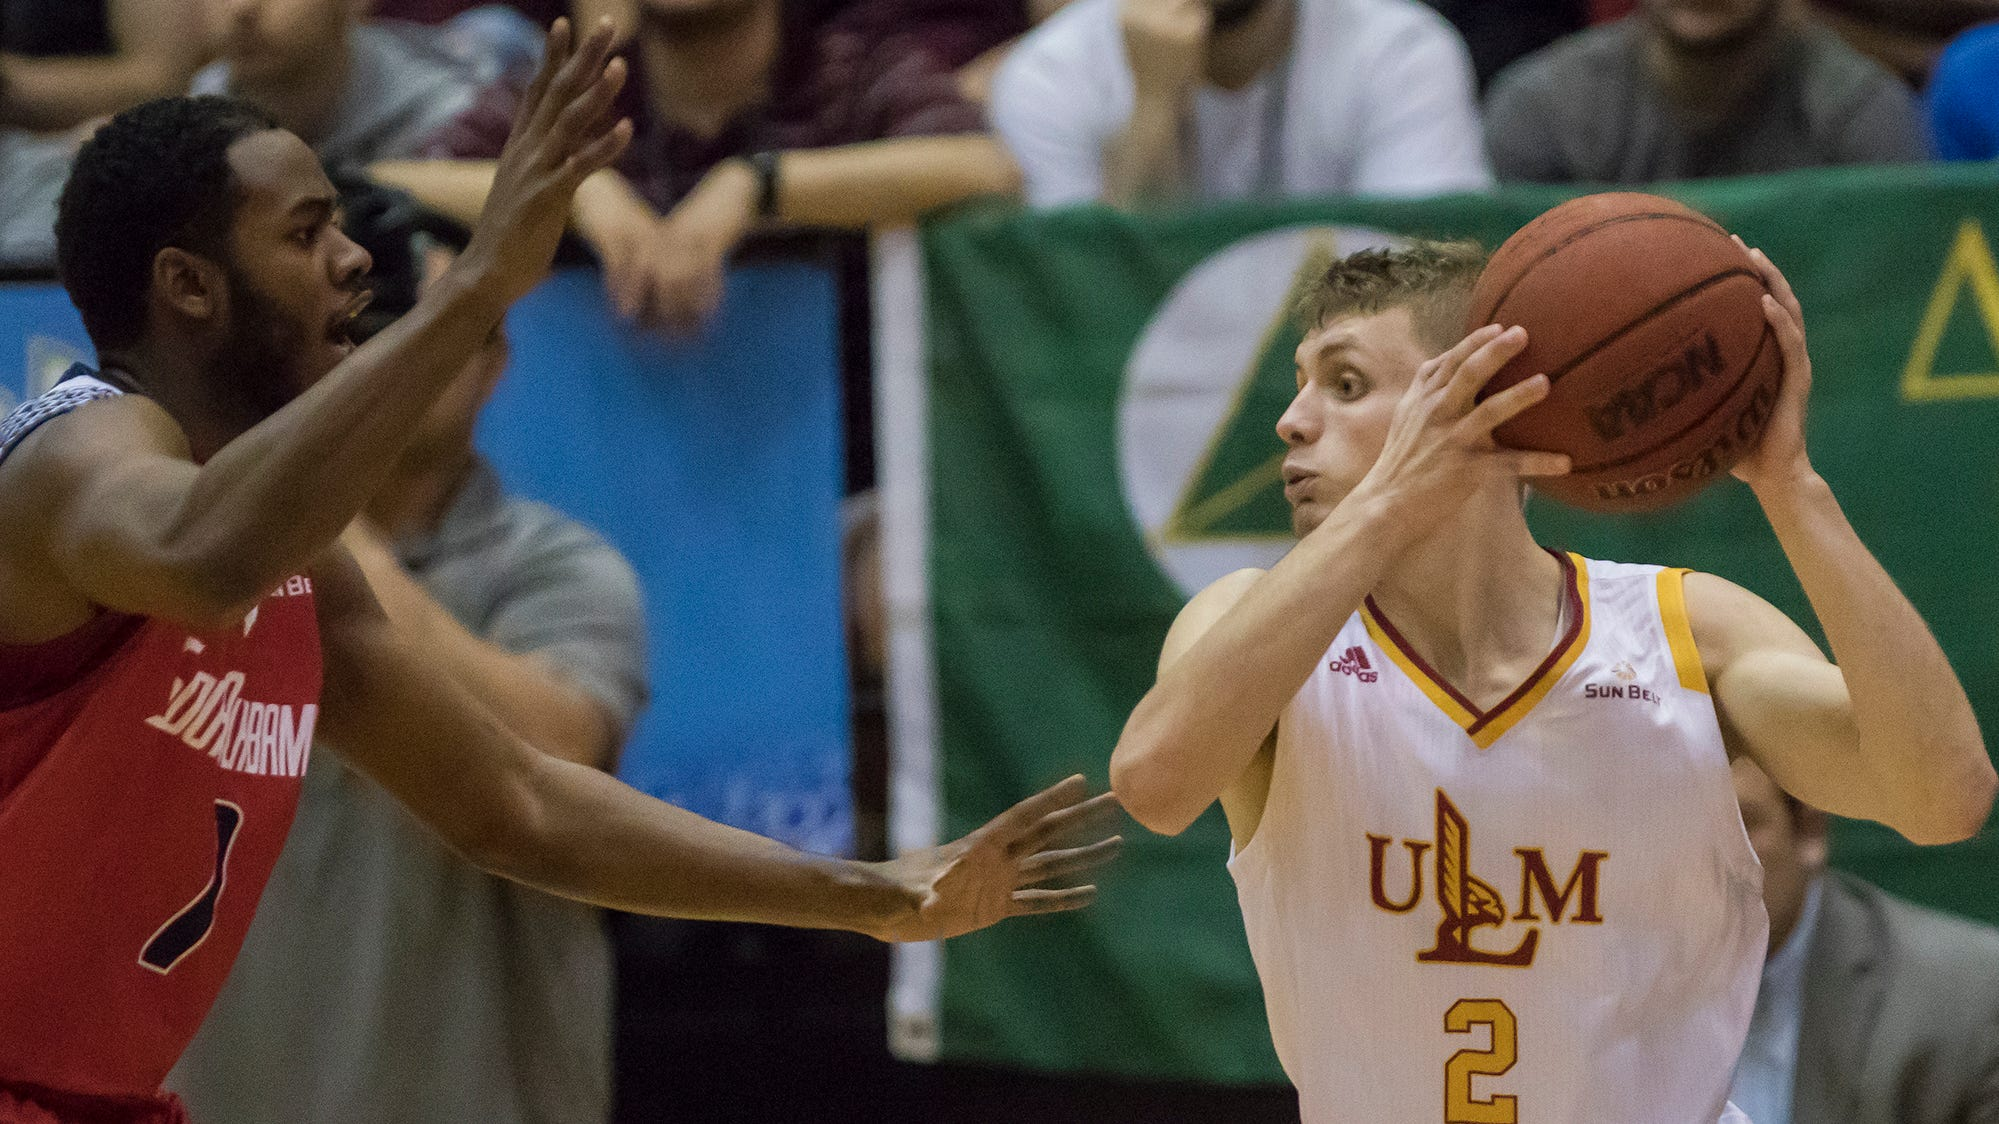 College roundup: UT-Arlington defeats ULM in double-overtime